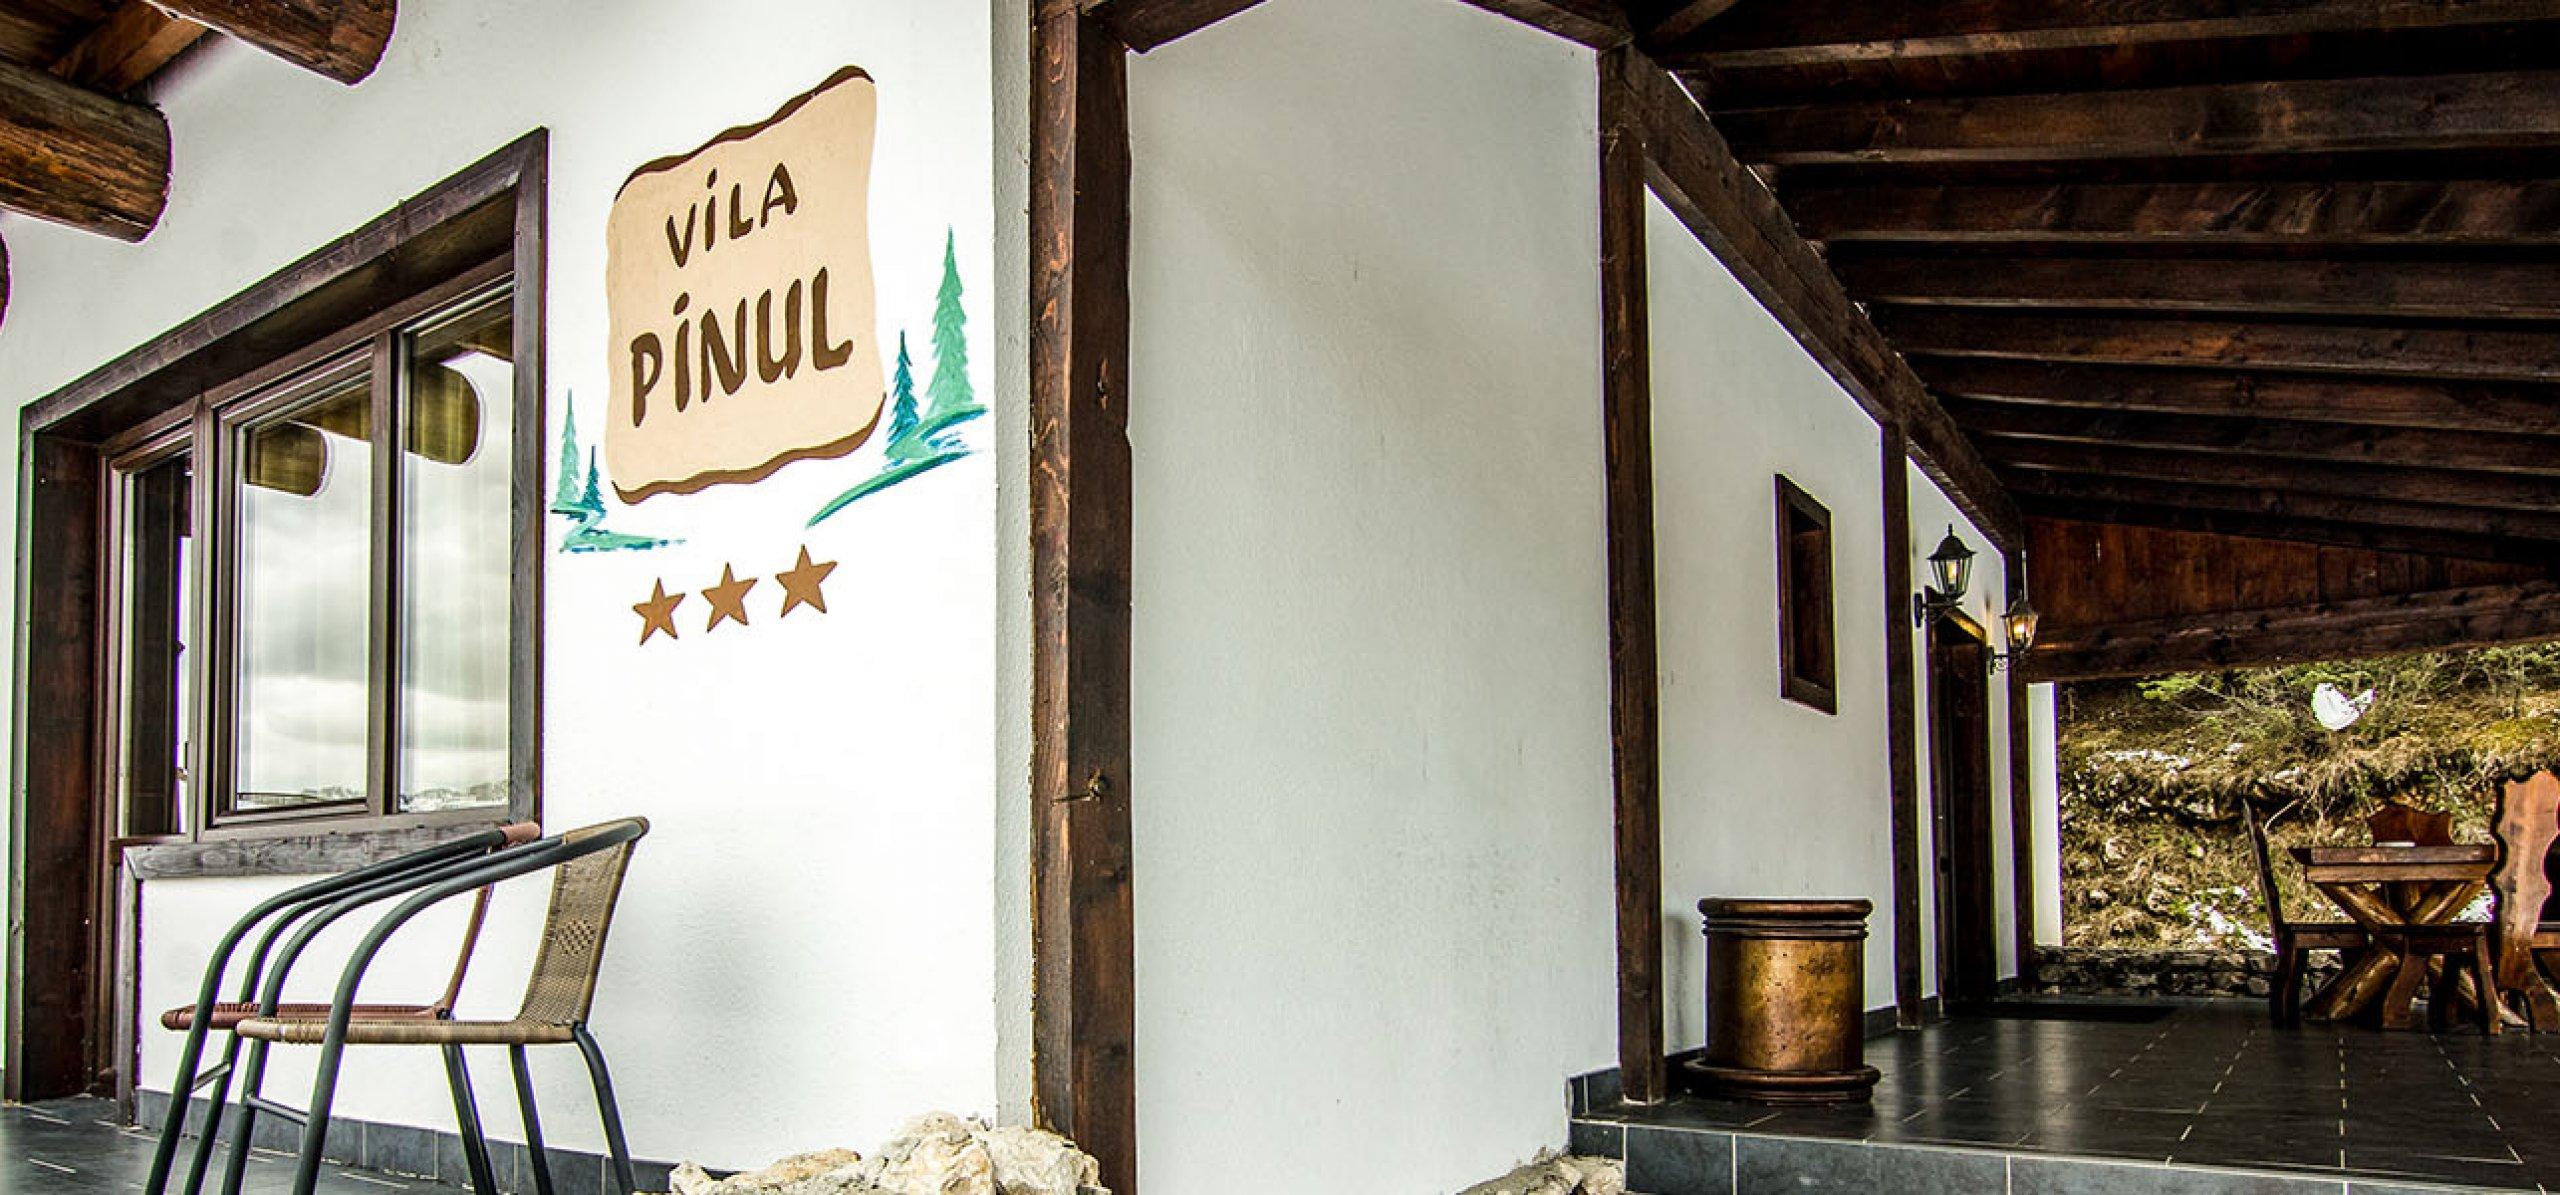 vila-pinul-3-stele-cazare-cheile-gradistei-fundata